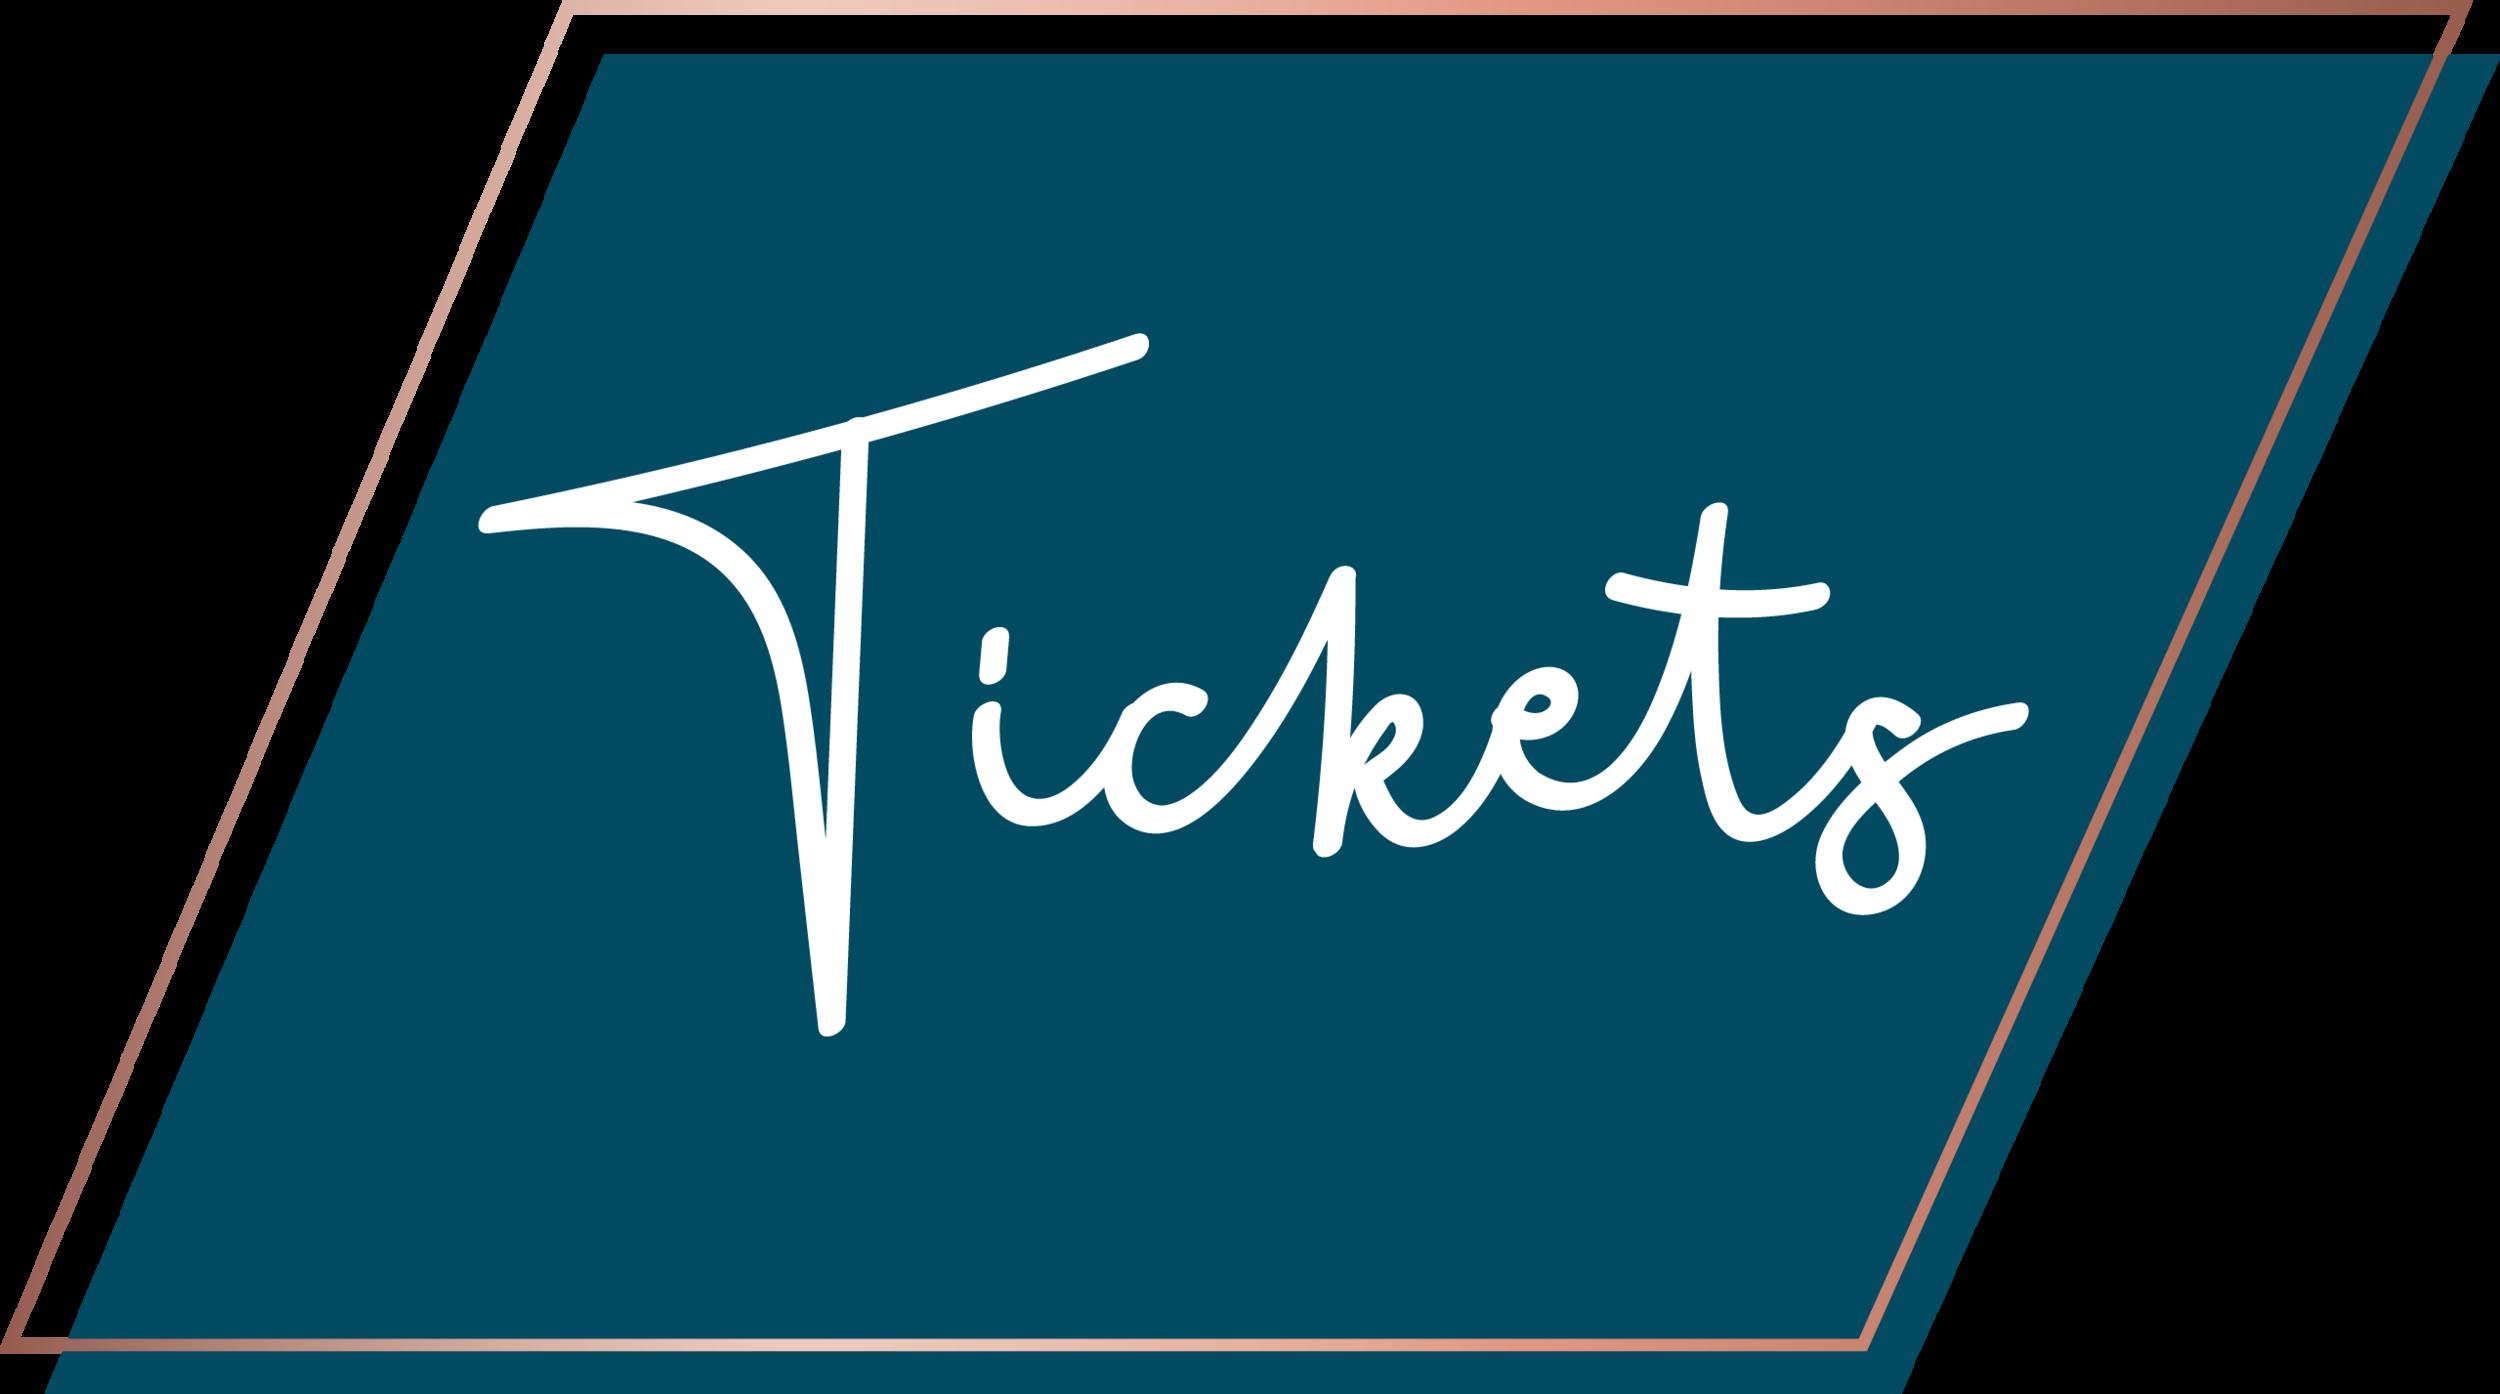 Chrisette Michele   Tickets   Tour   New Jack Theatre